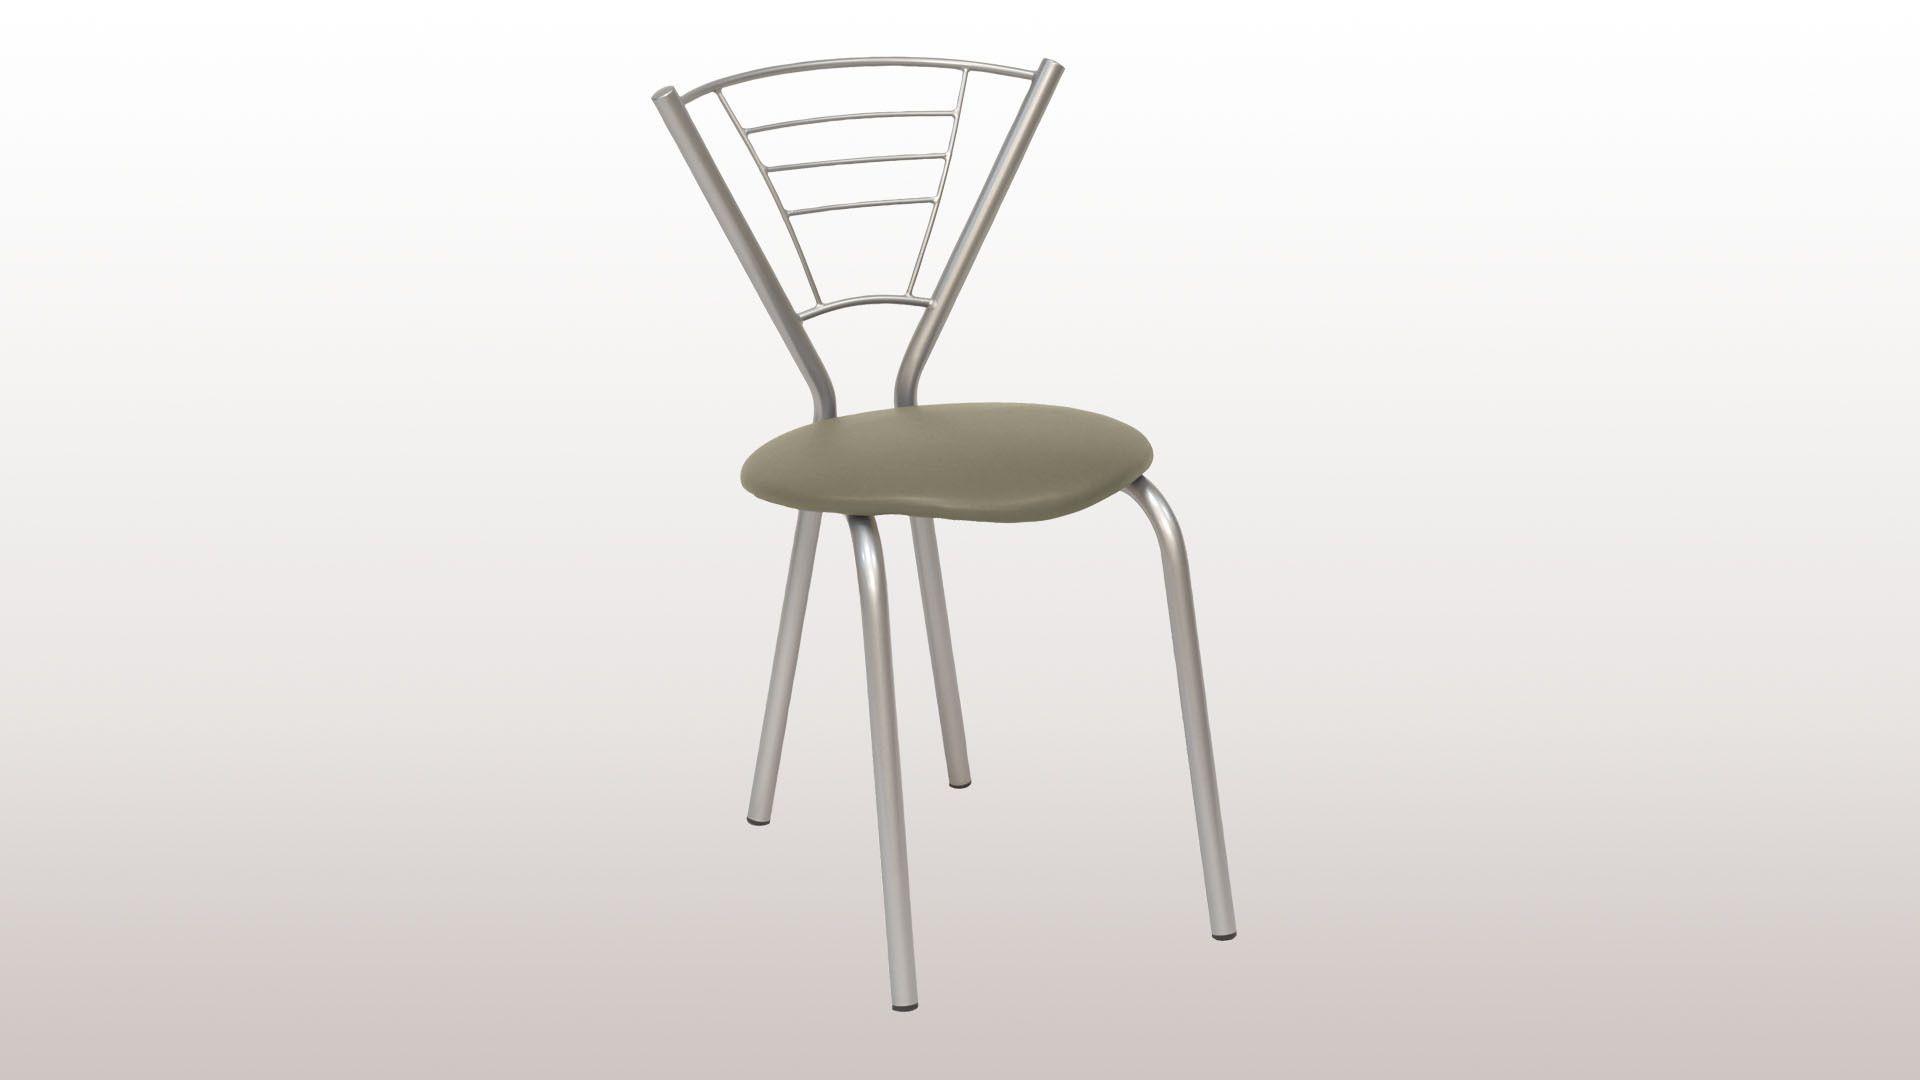 Chaise Corinne Cuisinella Chaise Table Et Chaises Chaise Design